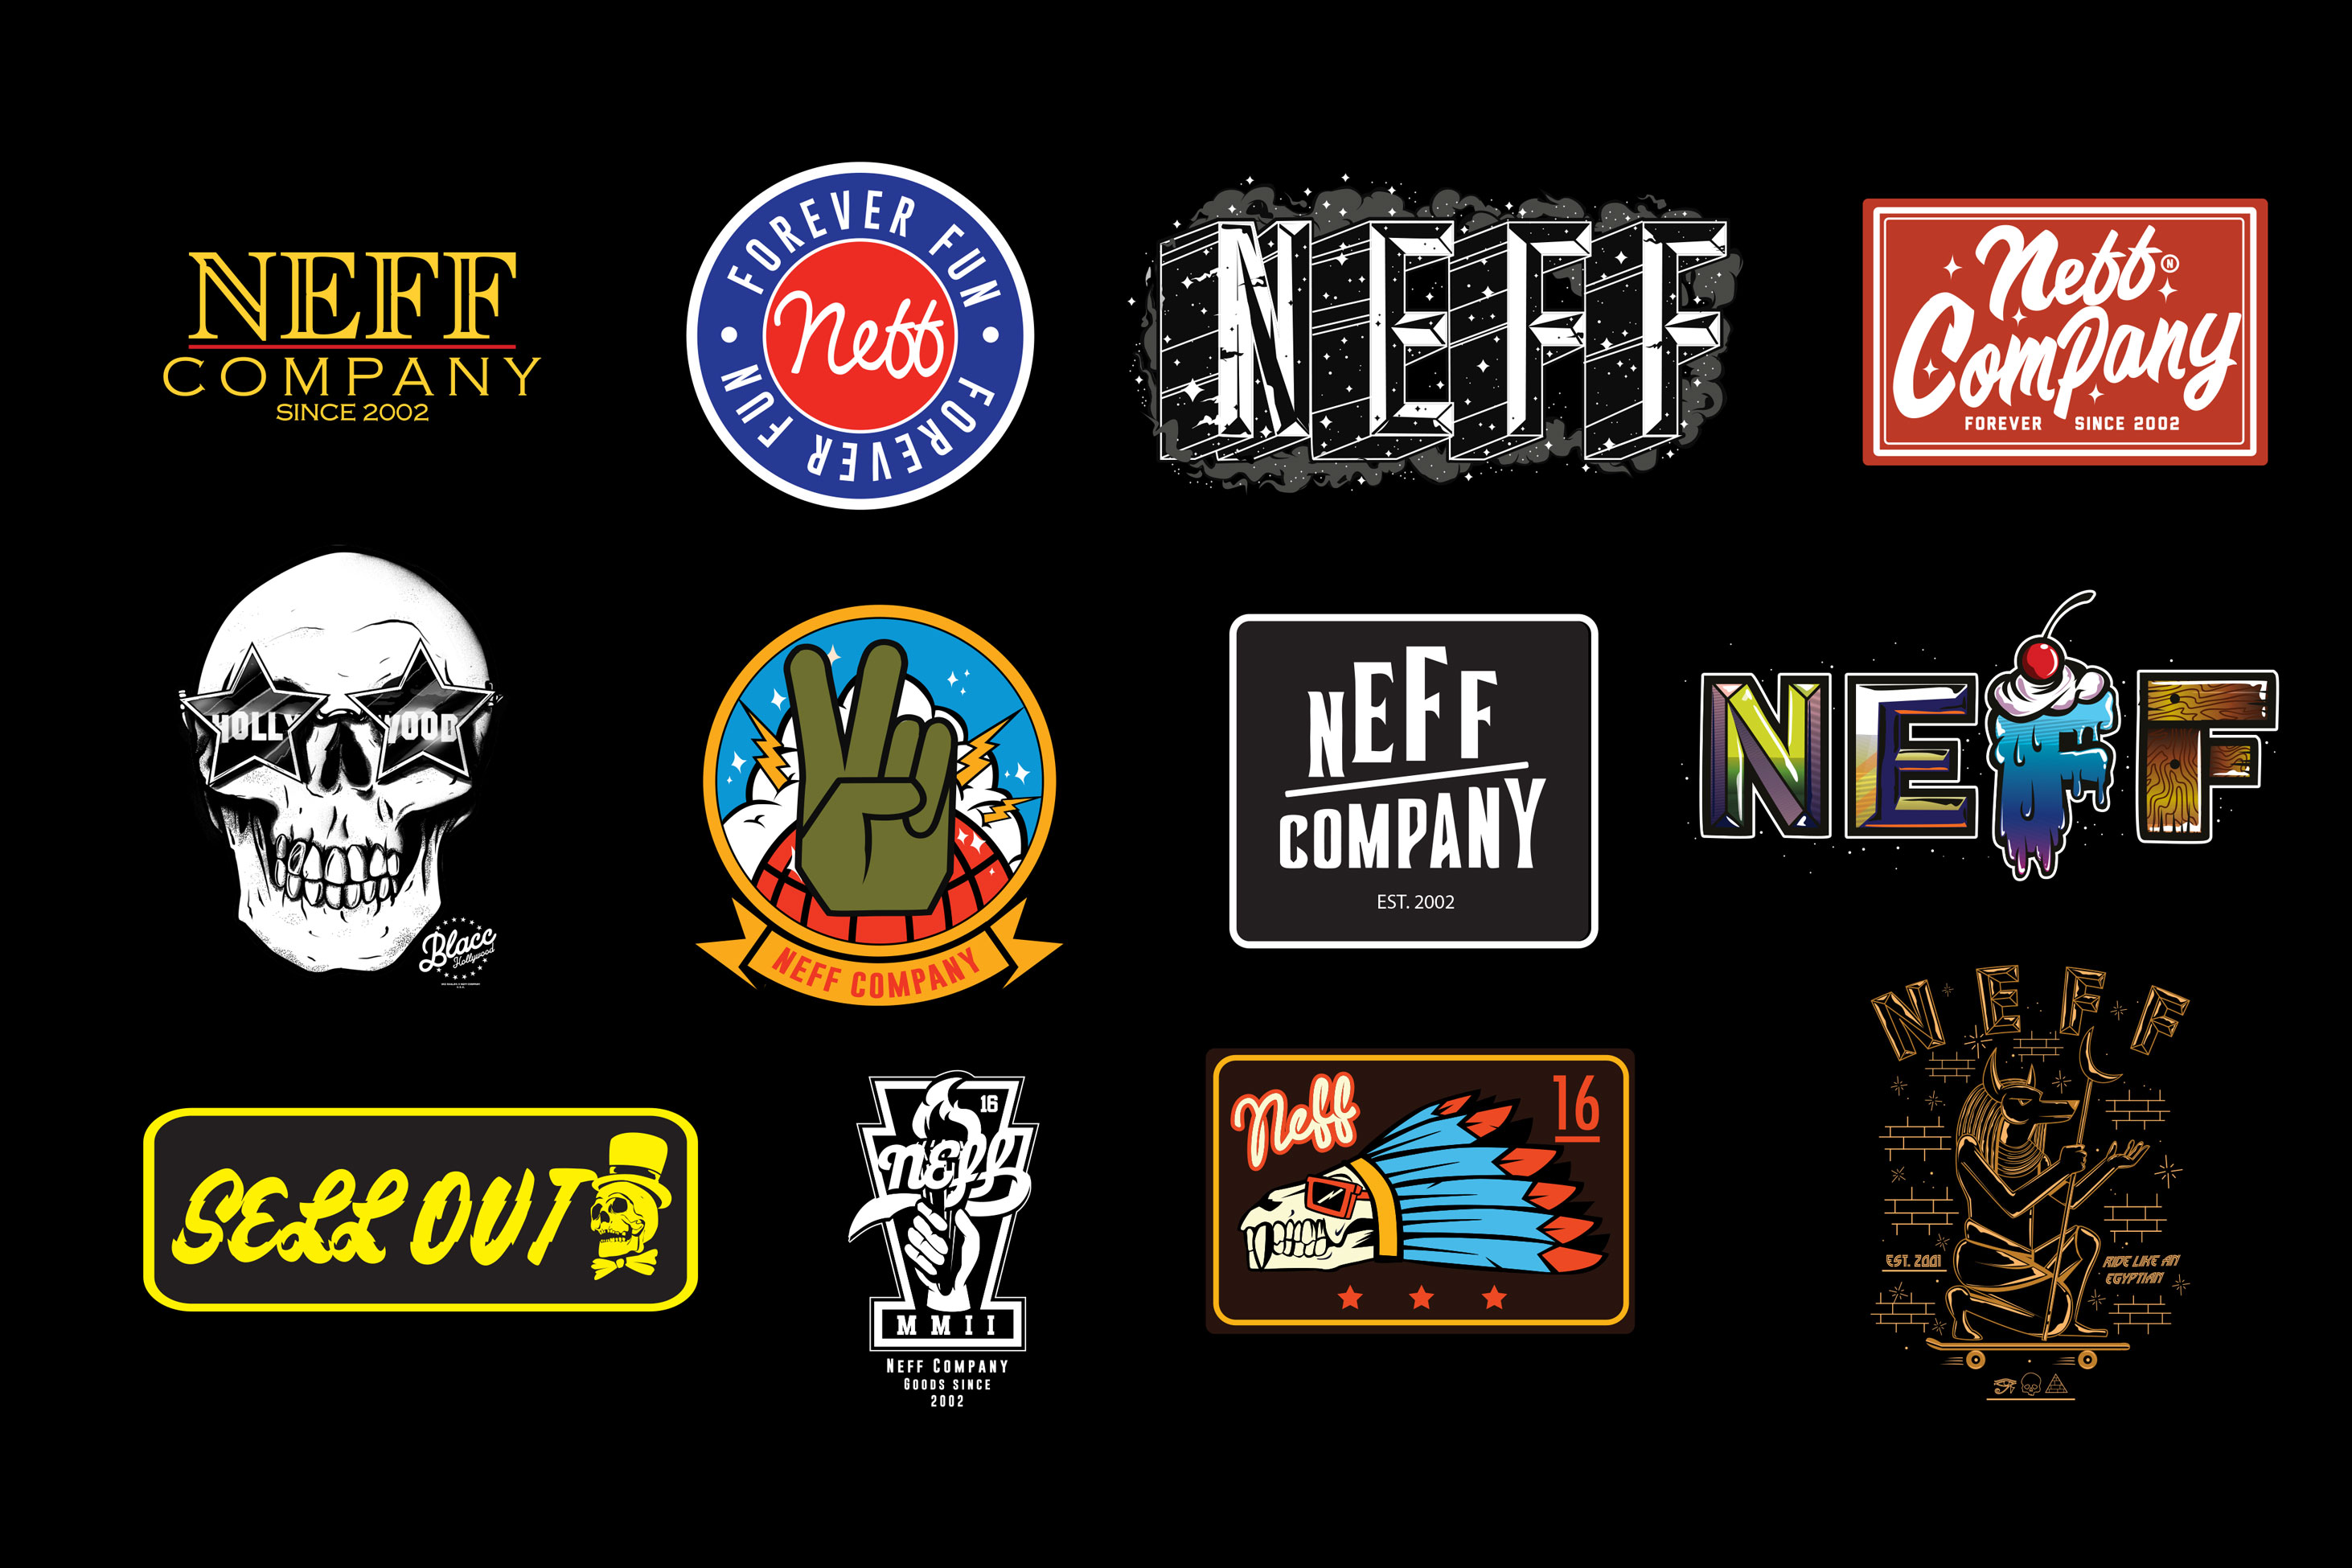 Neff-graphics-2